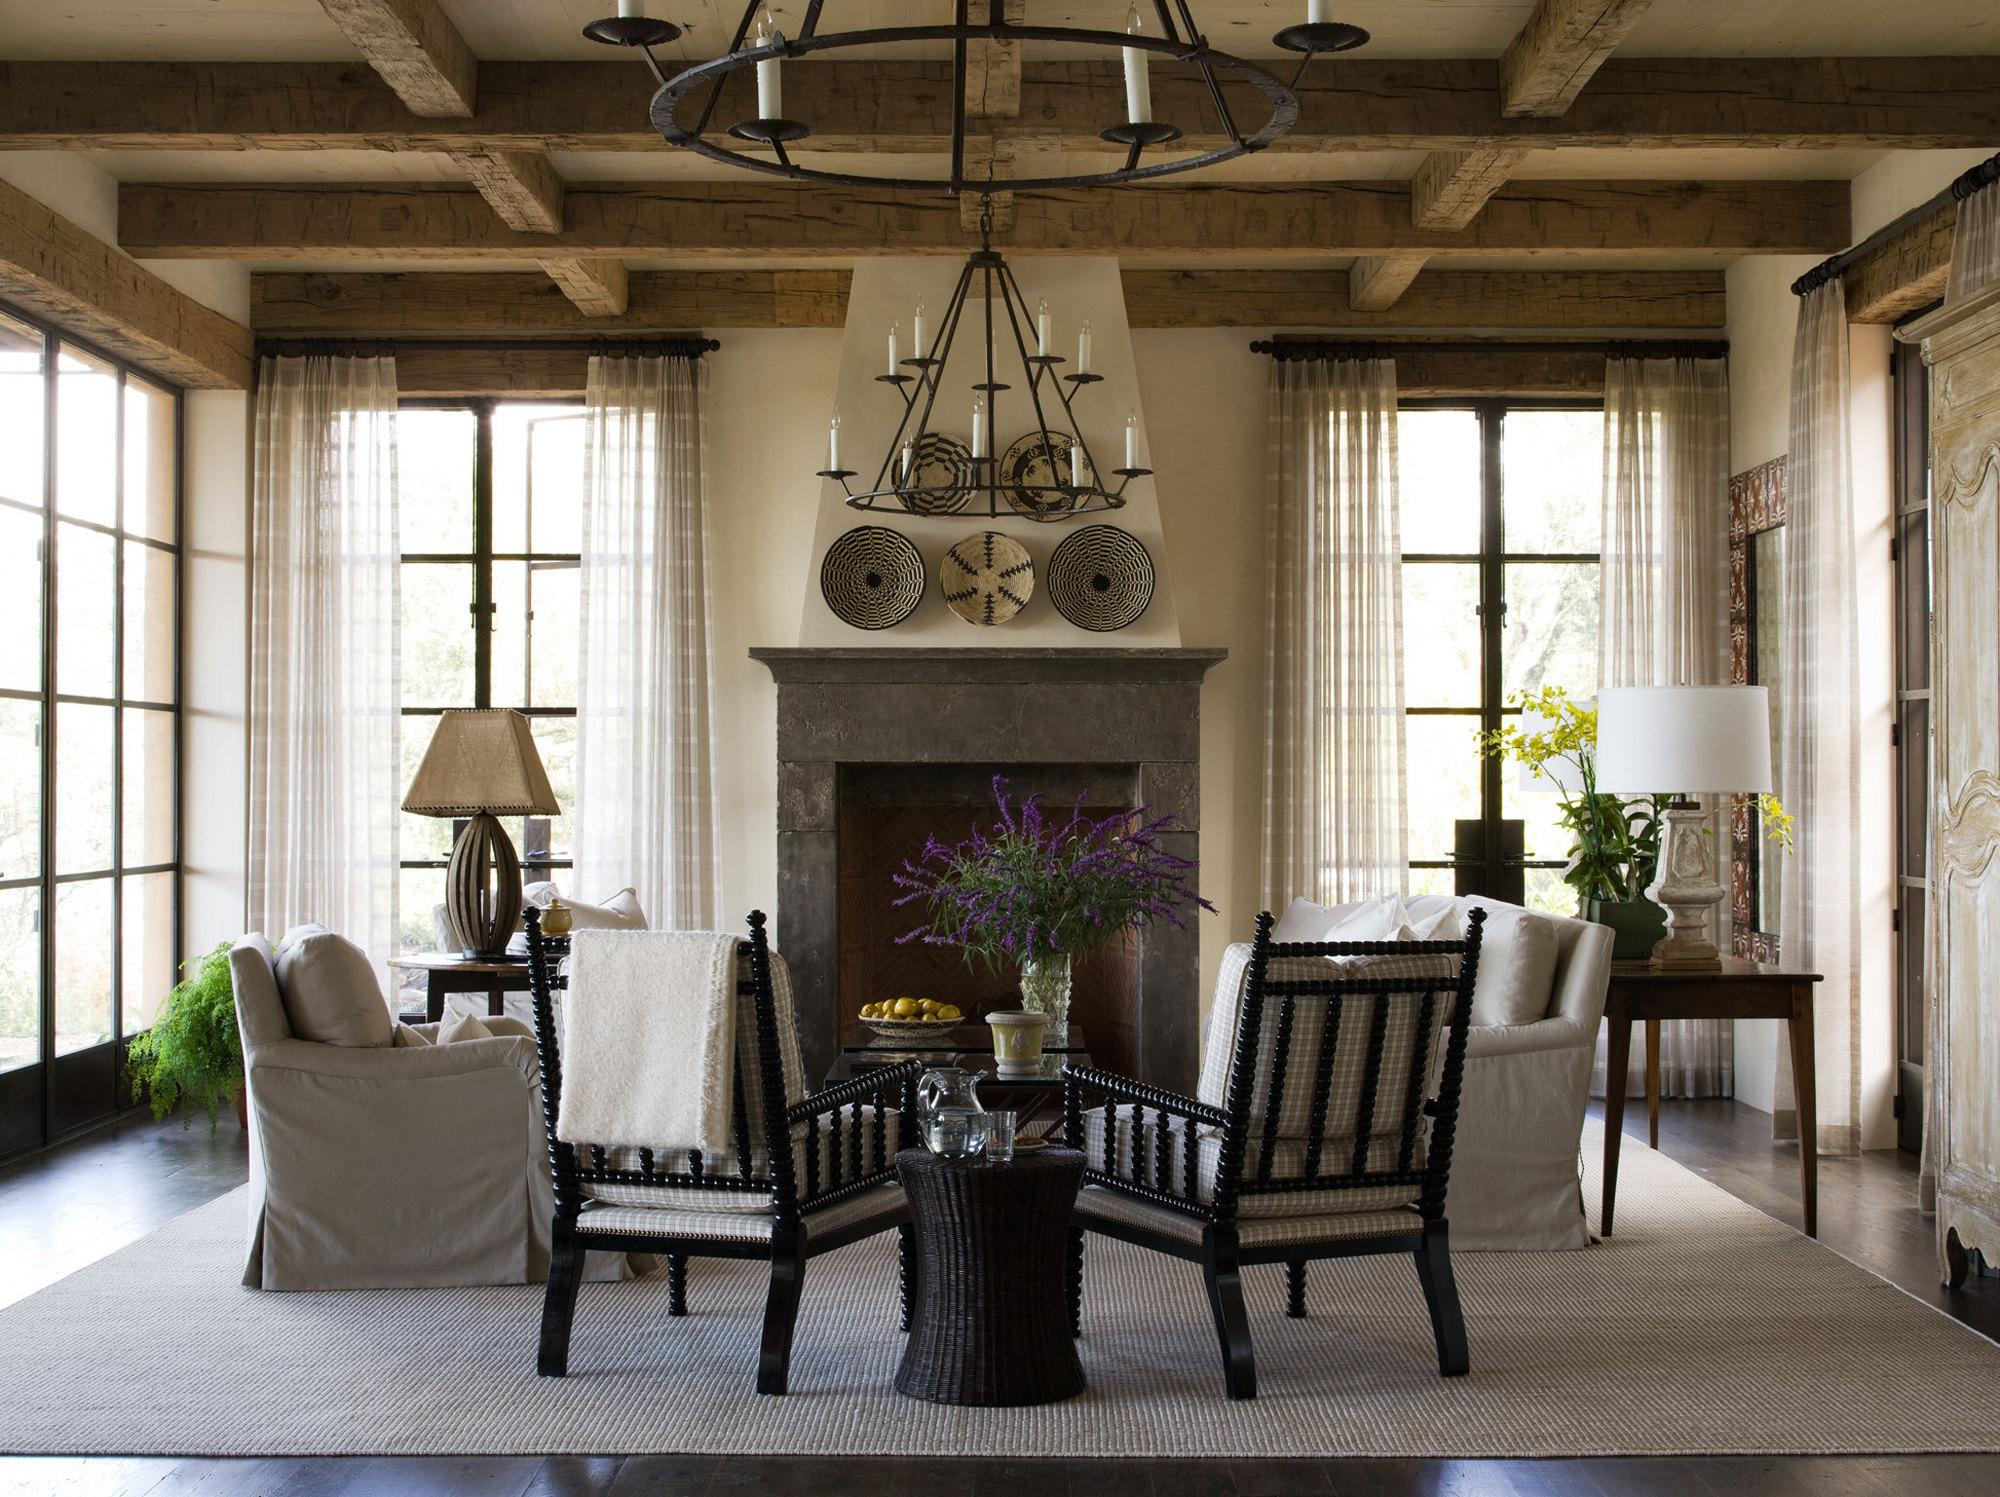 Napa Valley residence design   Marshall Watson Interiors on woodland house design, nipa house design, seaside house design, sea ranch house design, joshua tree house design,